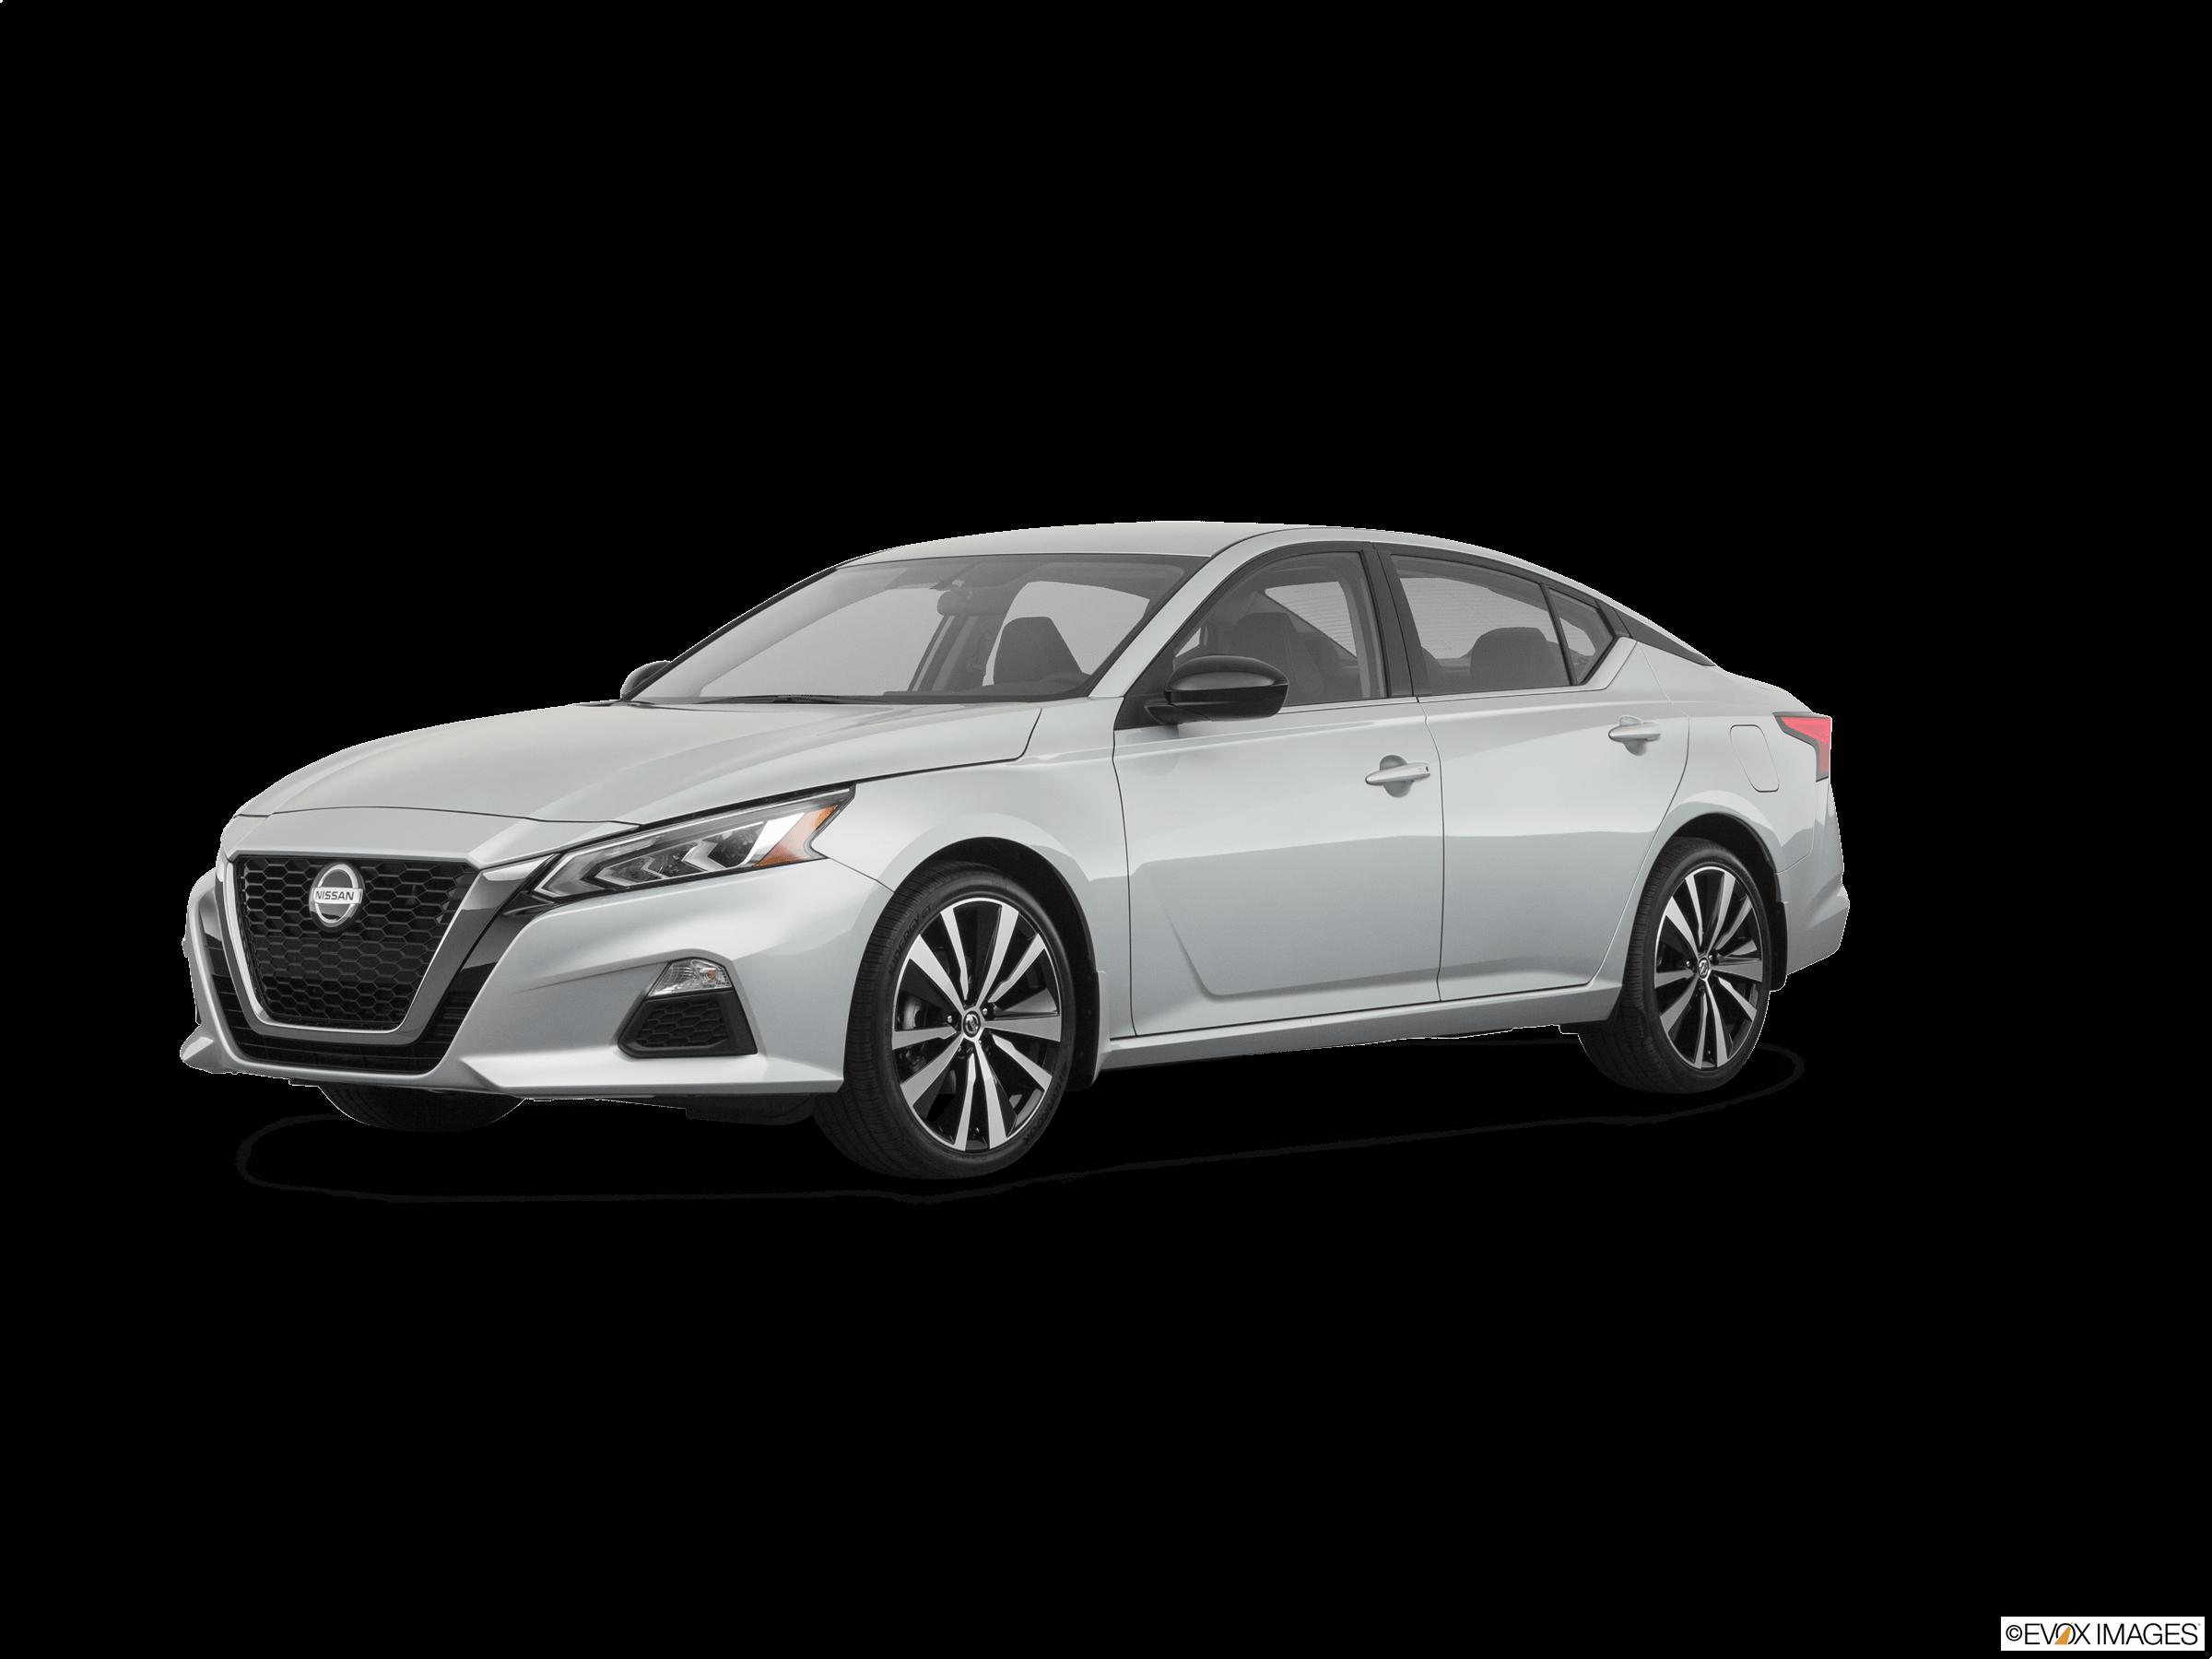 Lease 2020 Nissan Altima Sedan 2.0 Platinum in New York, New Jersey, Pennsylvania